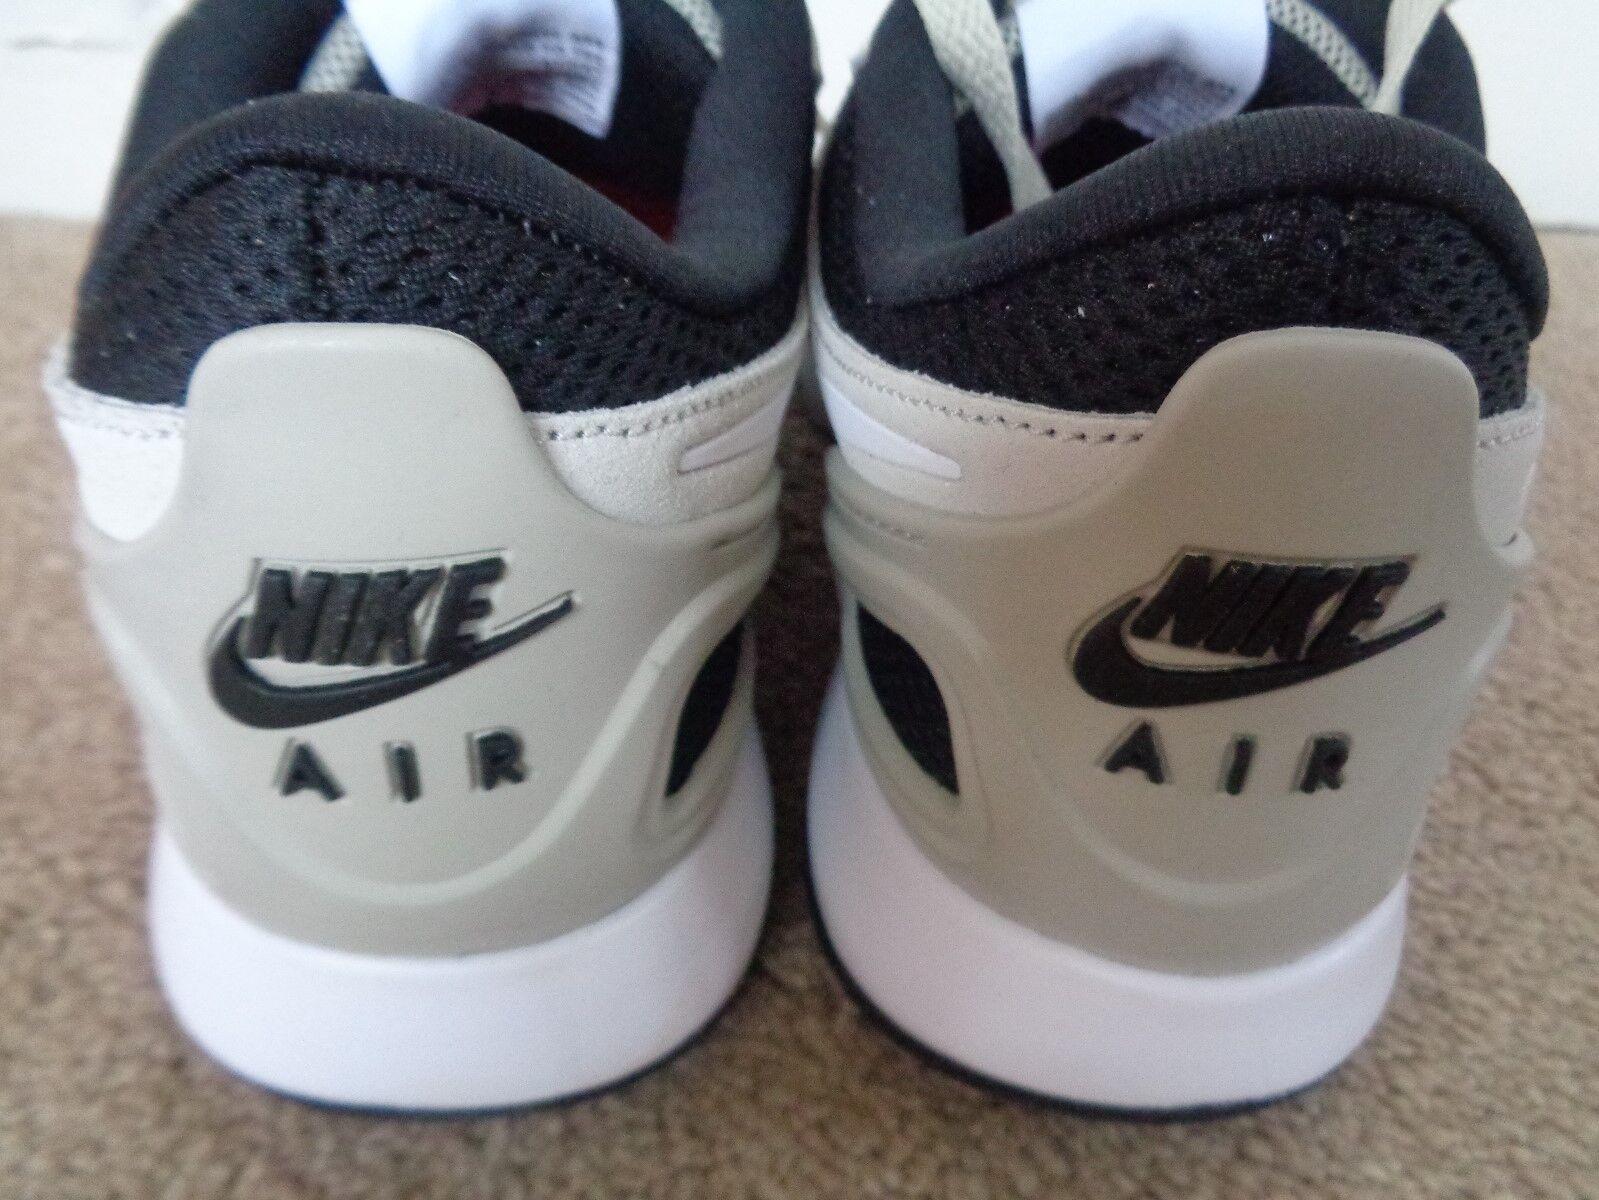 Nike Air Vibenna SE trainers sneakers shoes 902807 902807 902807 001 eu 45 us 11 NEW+BOX 74930b